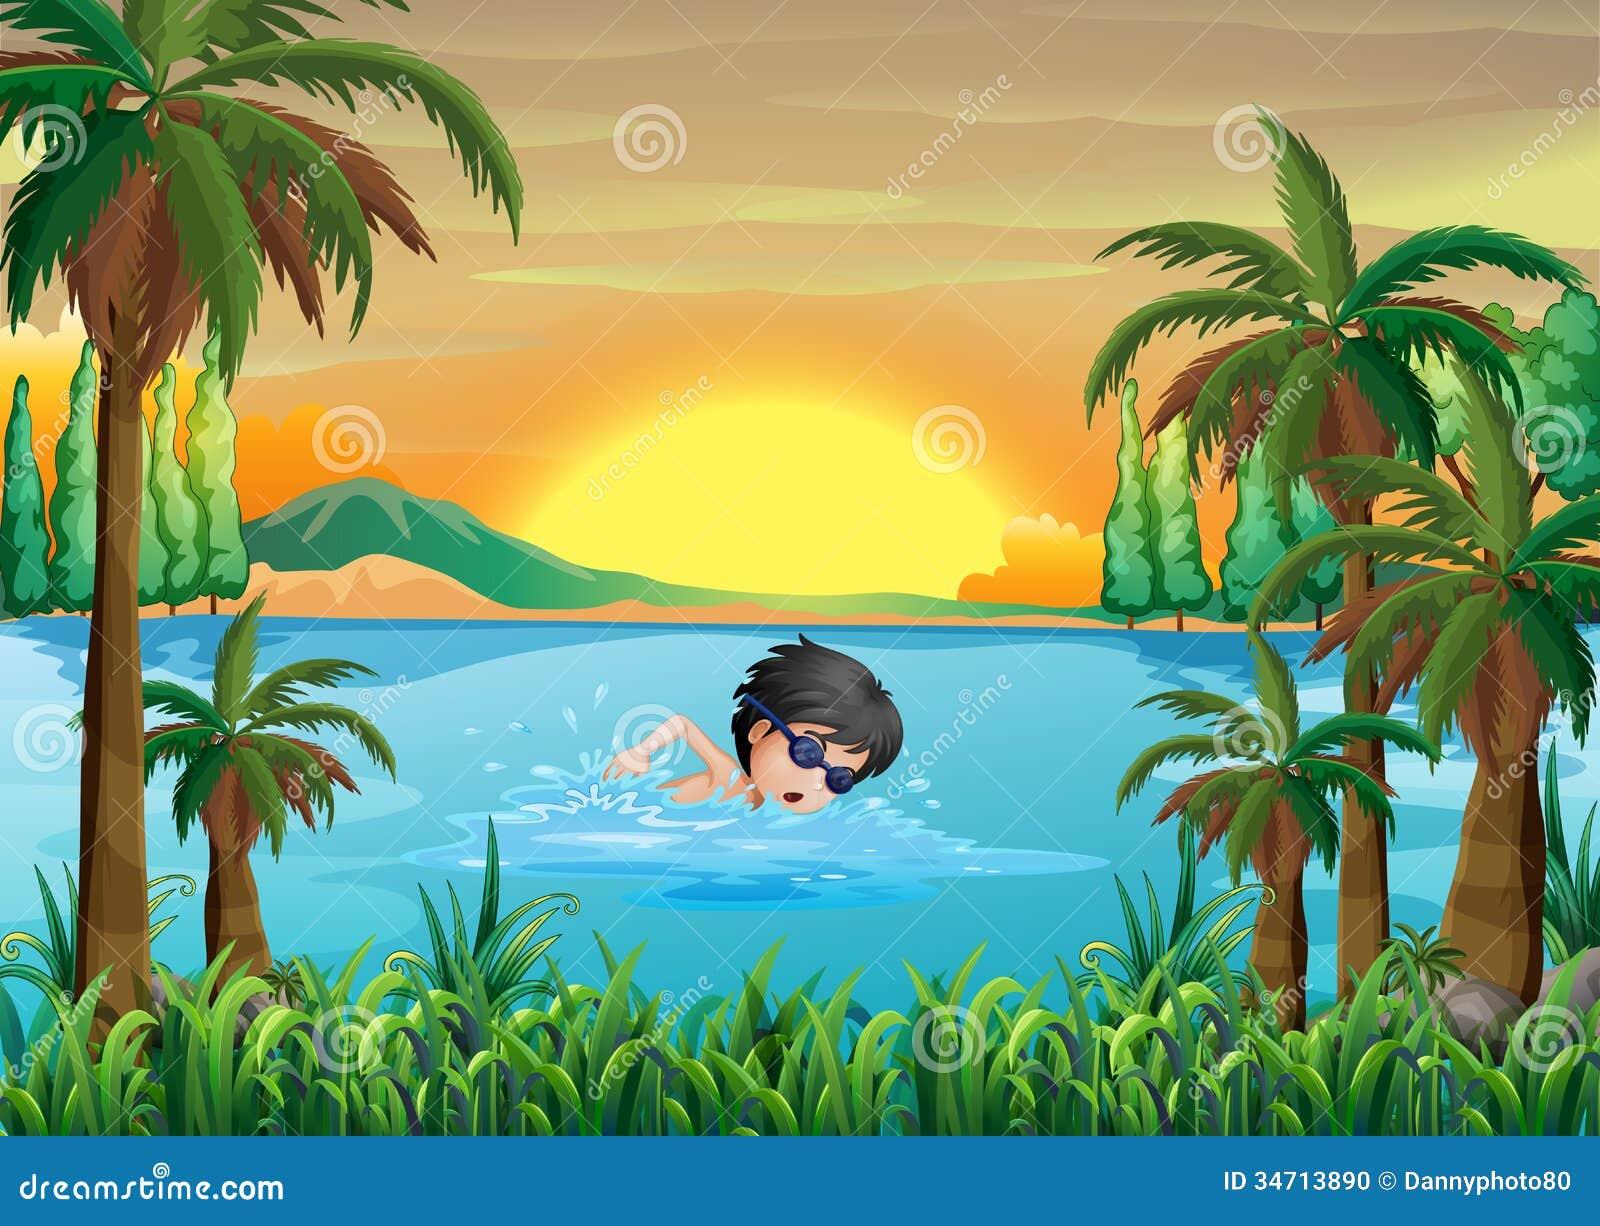 a boy swimming at the lake stock photo image 34713890